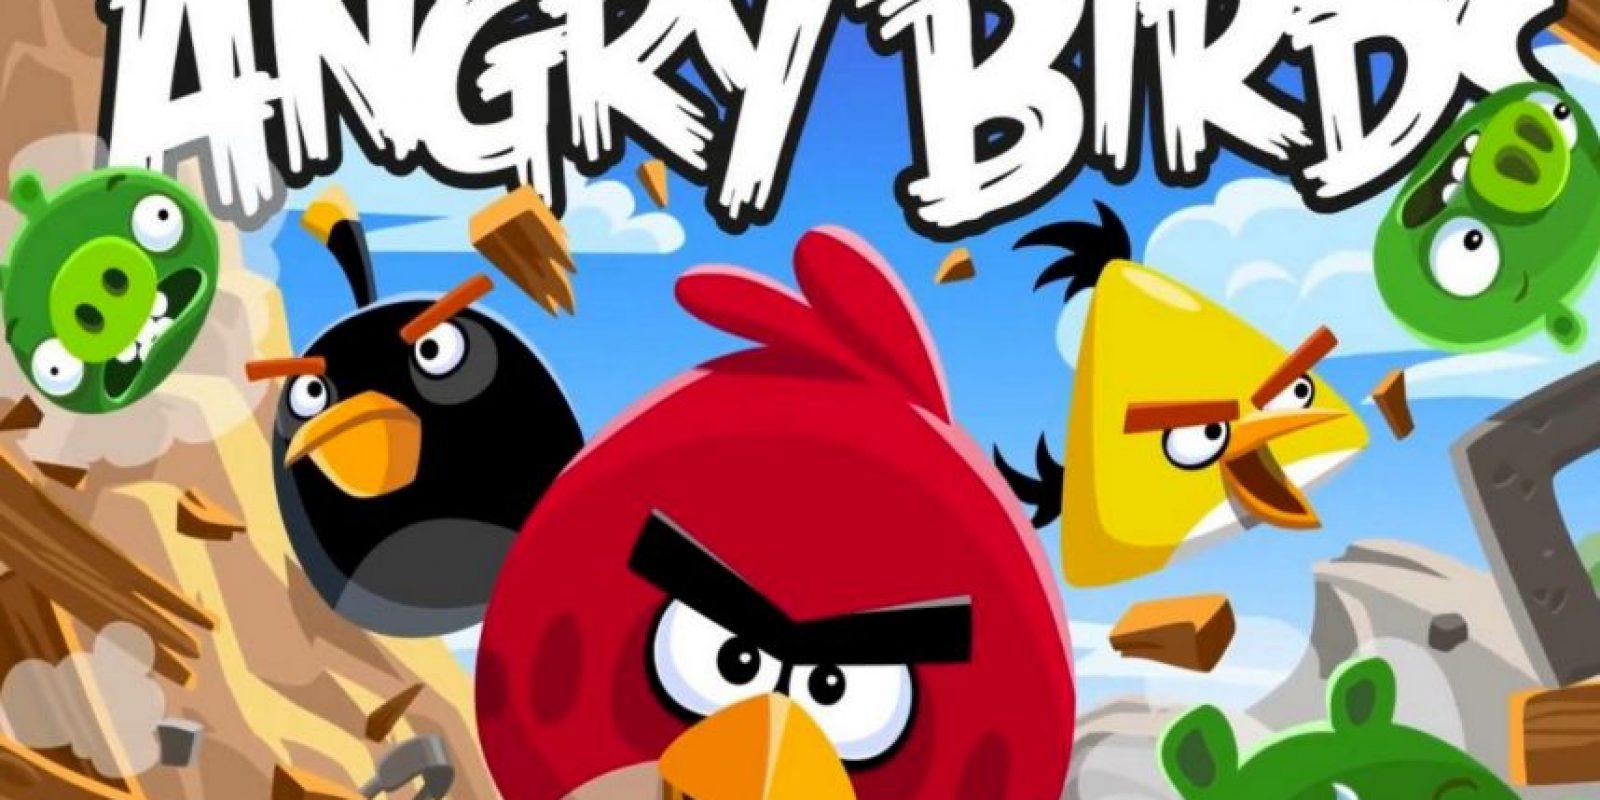 Angry Birds (2009) Foto:Rovio Entertainment Ltd